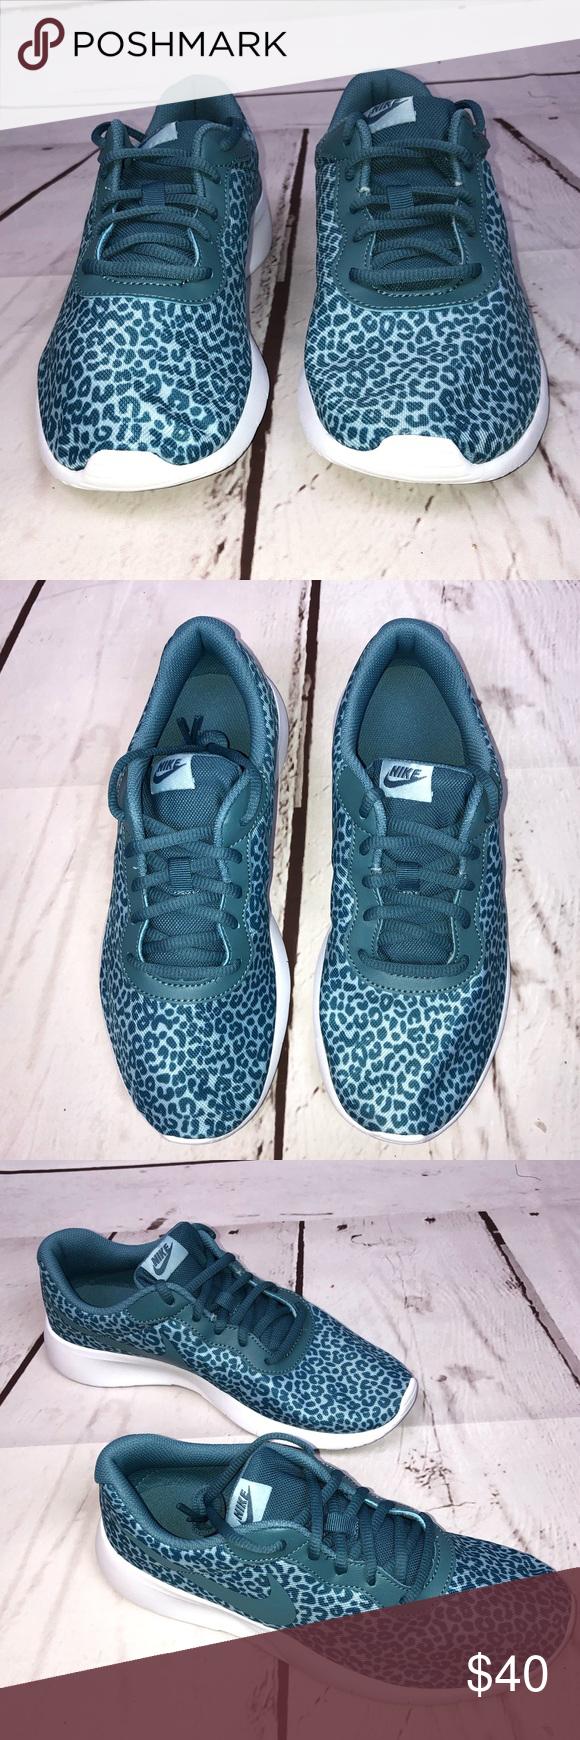 Nike Tanjun Blue Leopard Print Sneakers